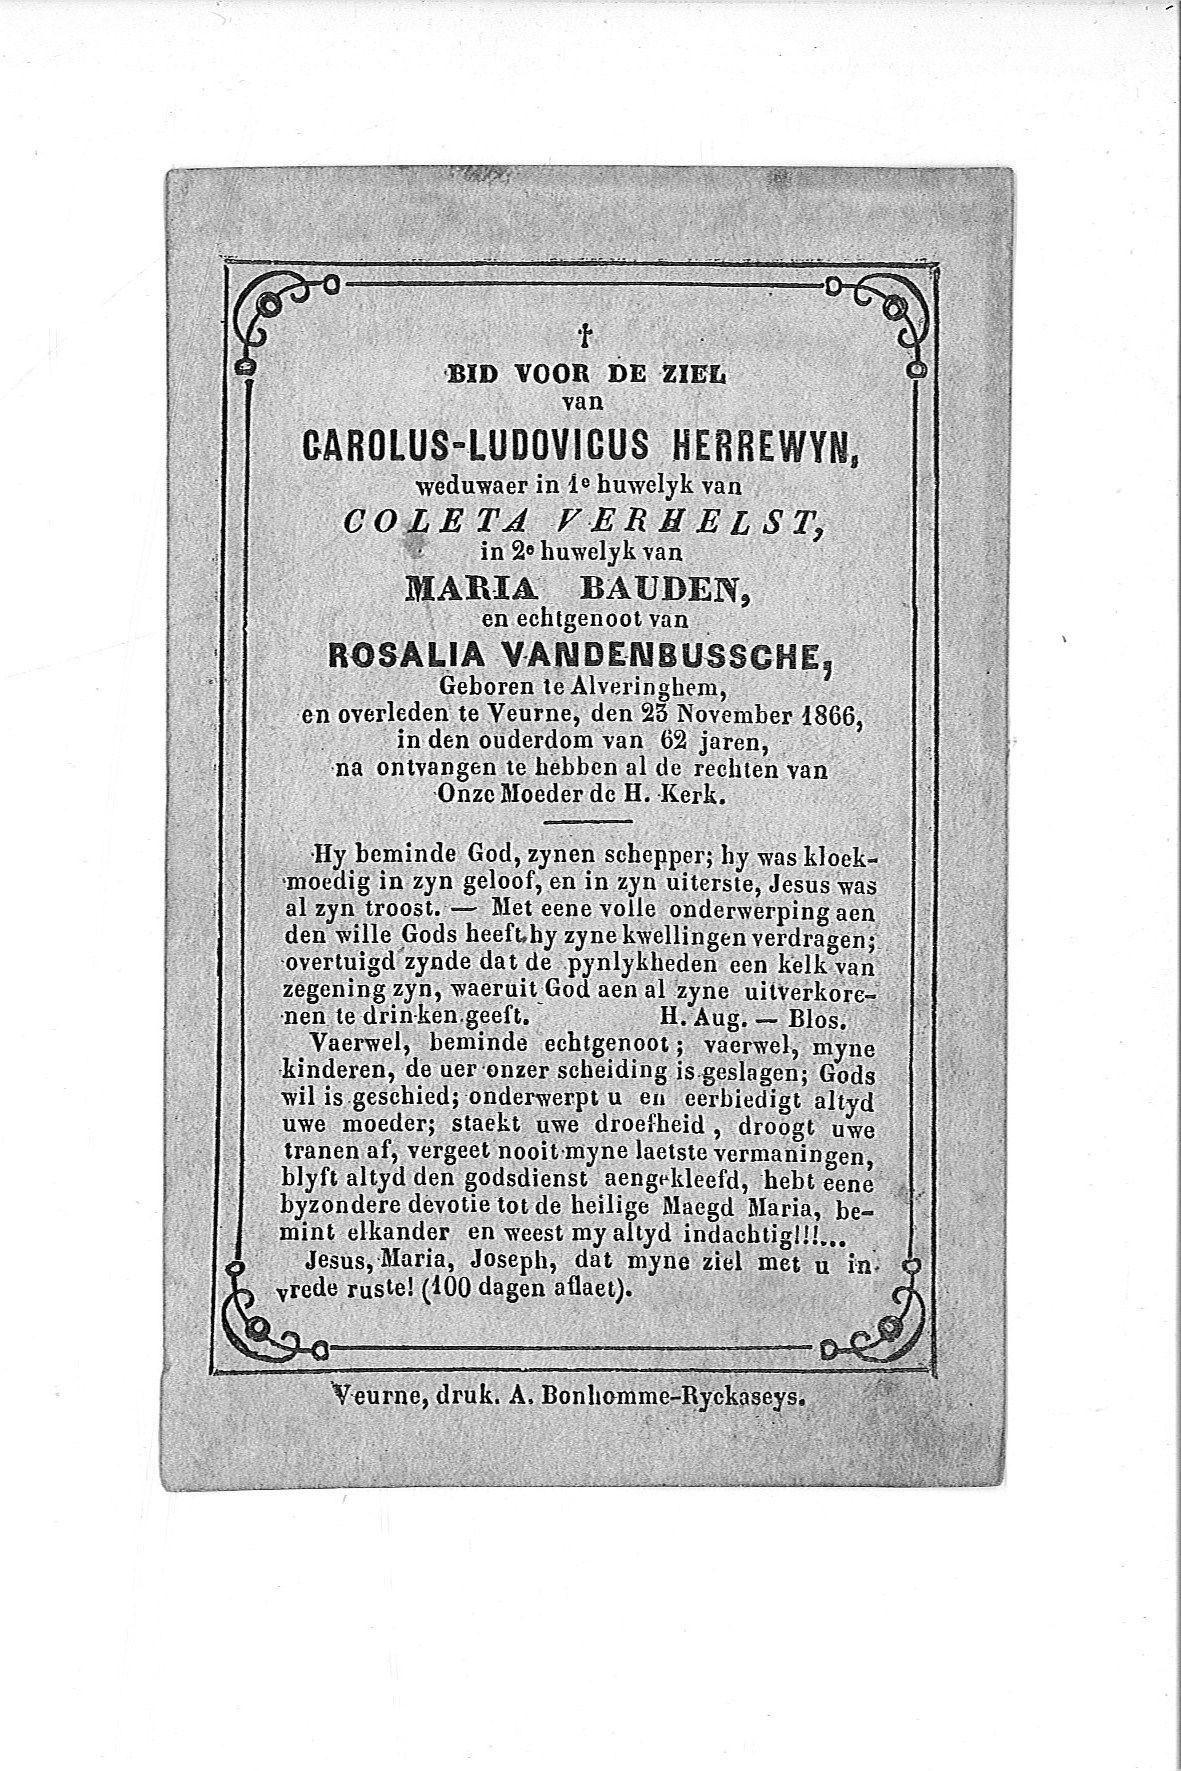 Carolus-Ludovicus (1866) 20090427162845_00035.jpg